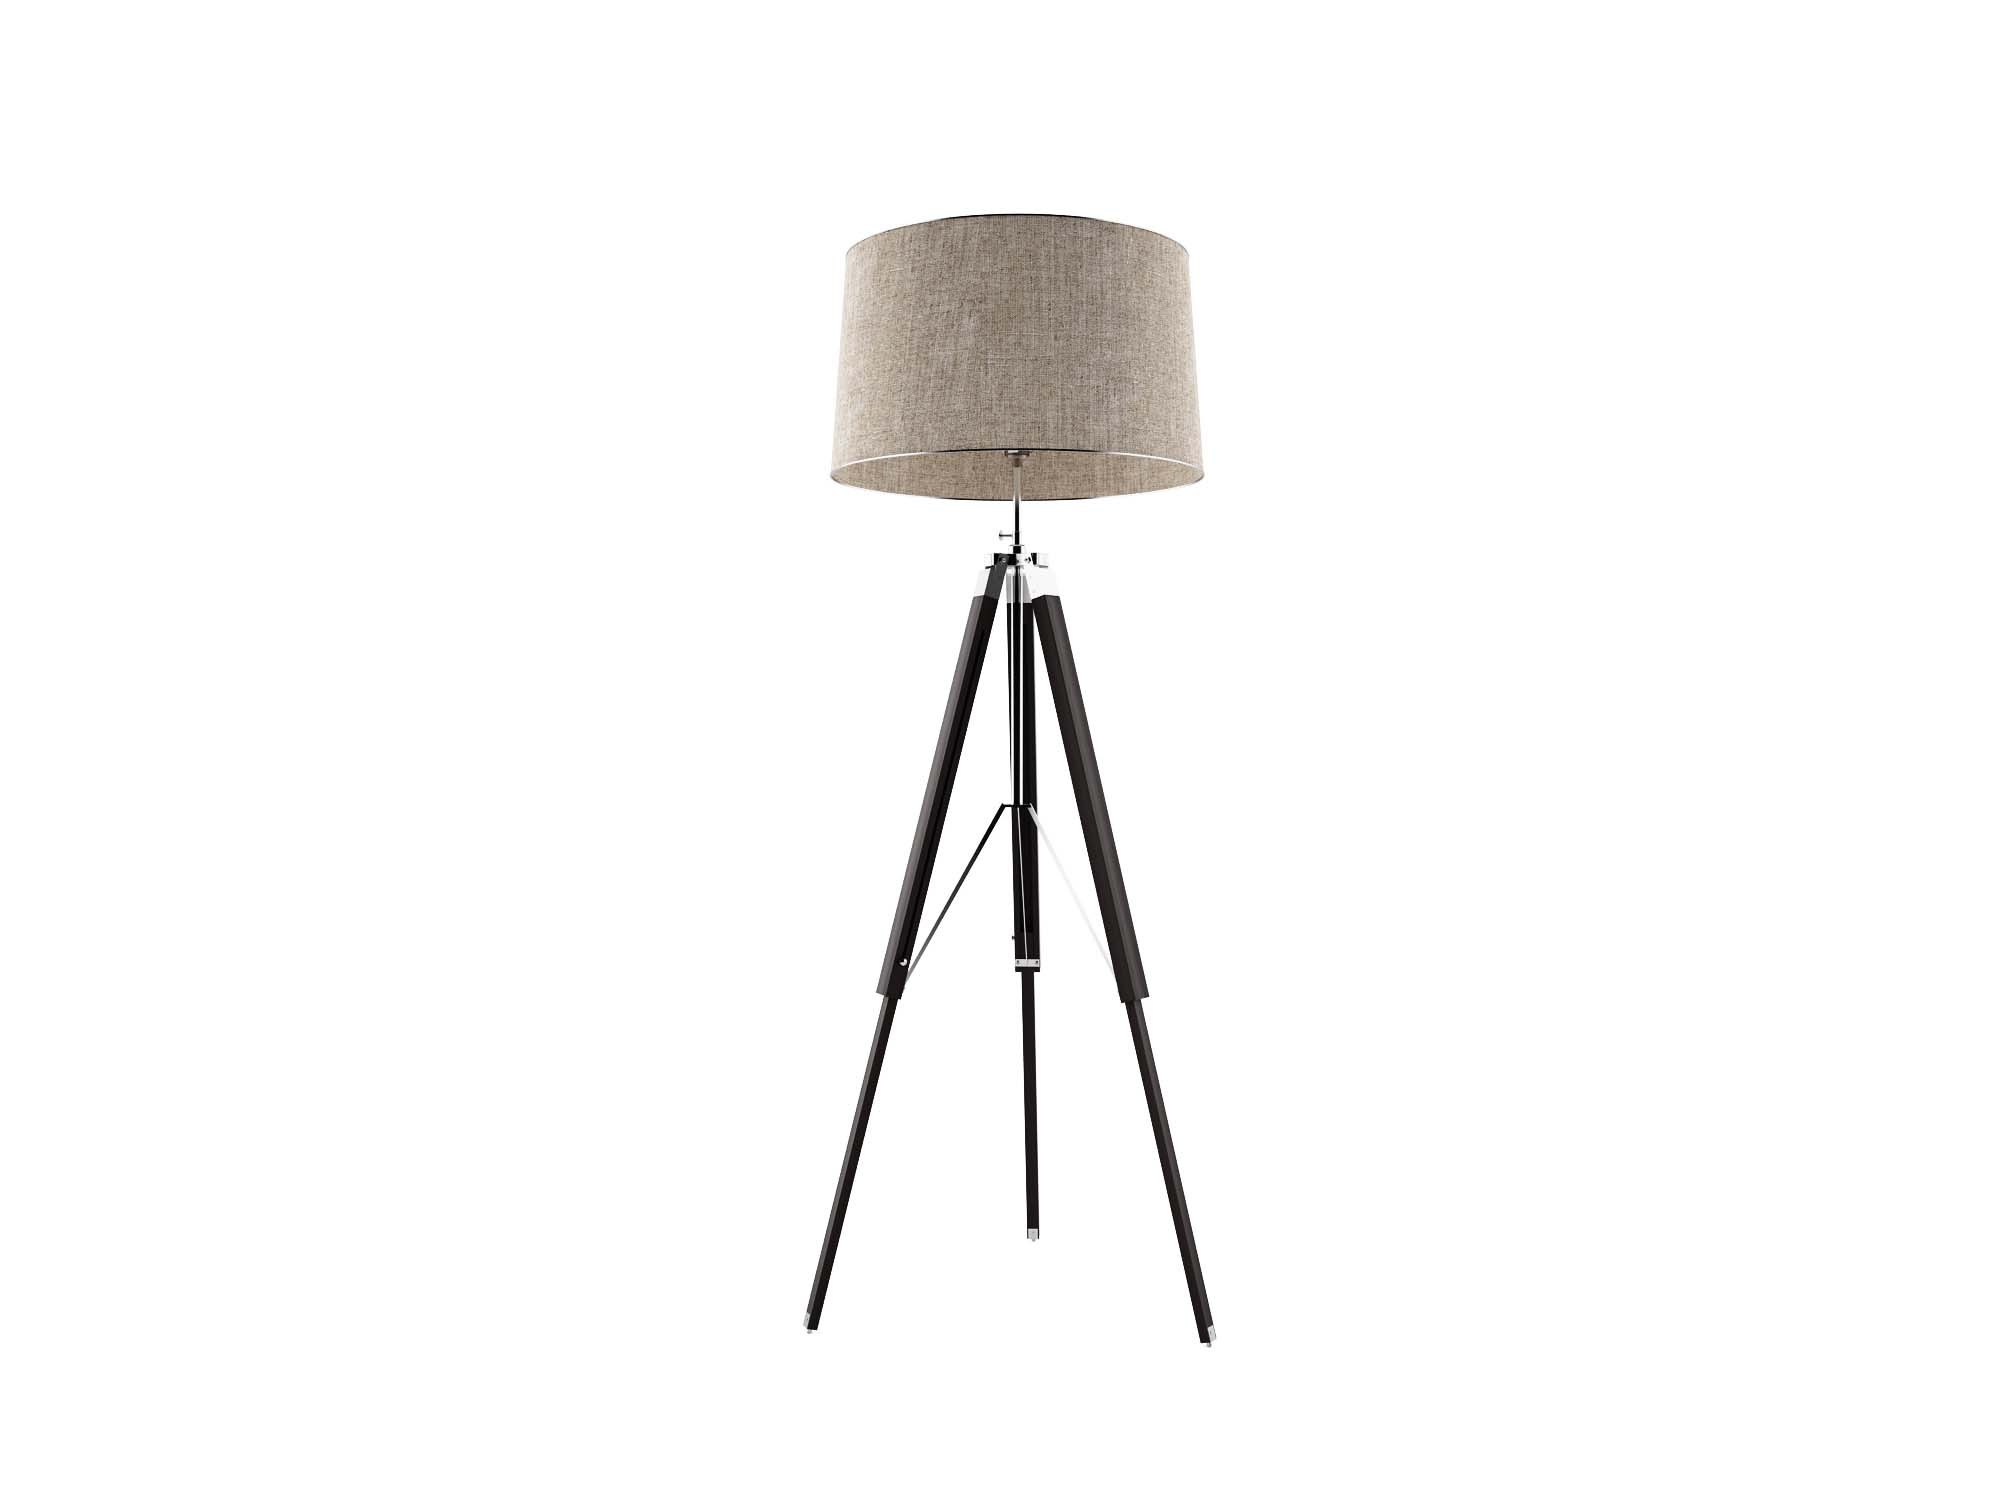 Free Tripod Lamp 3d Model